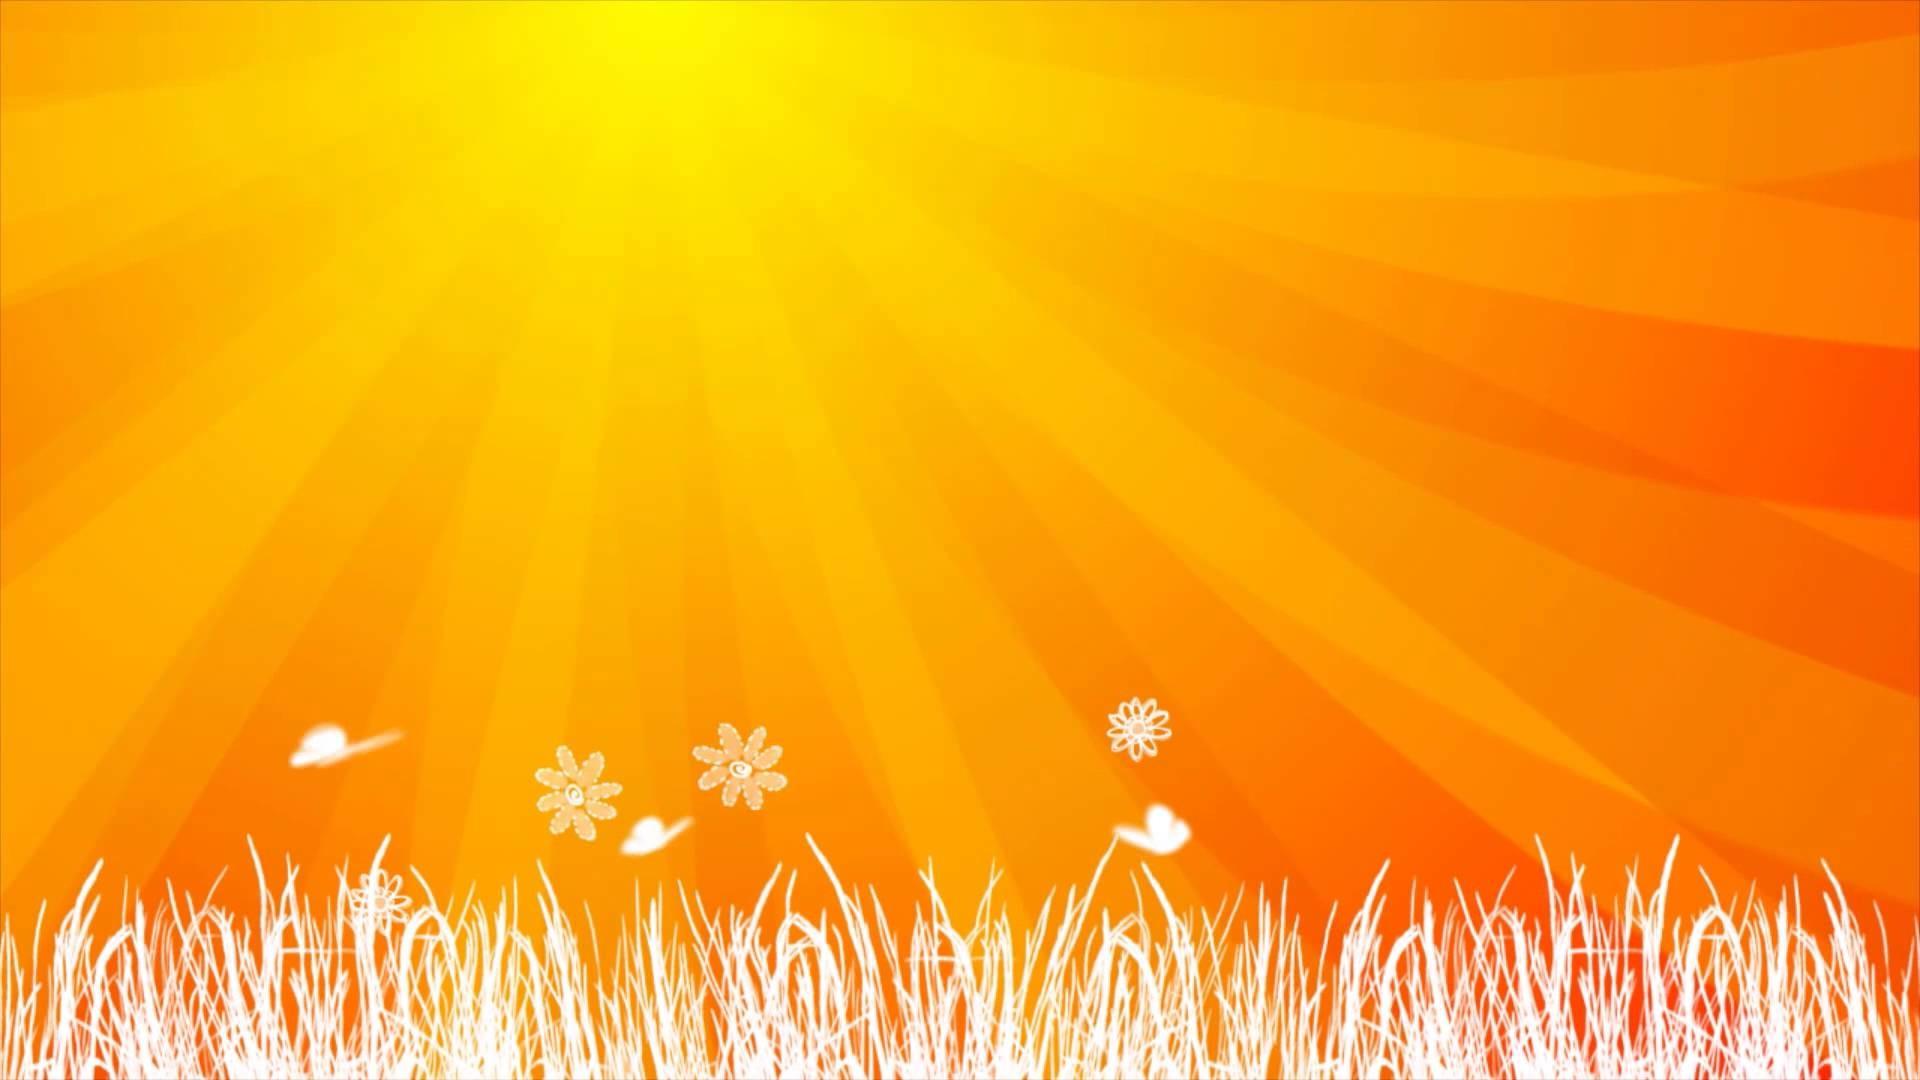 Orange And Yellow Wallpaper Desktop